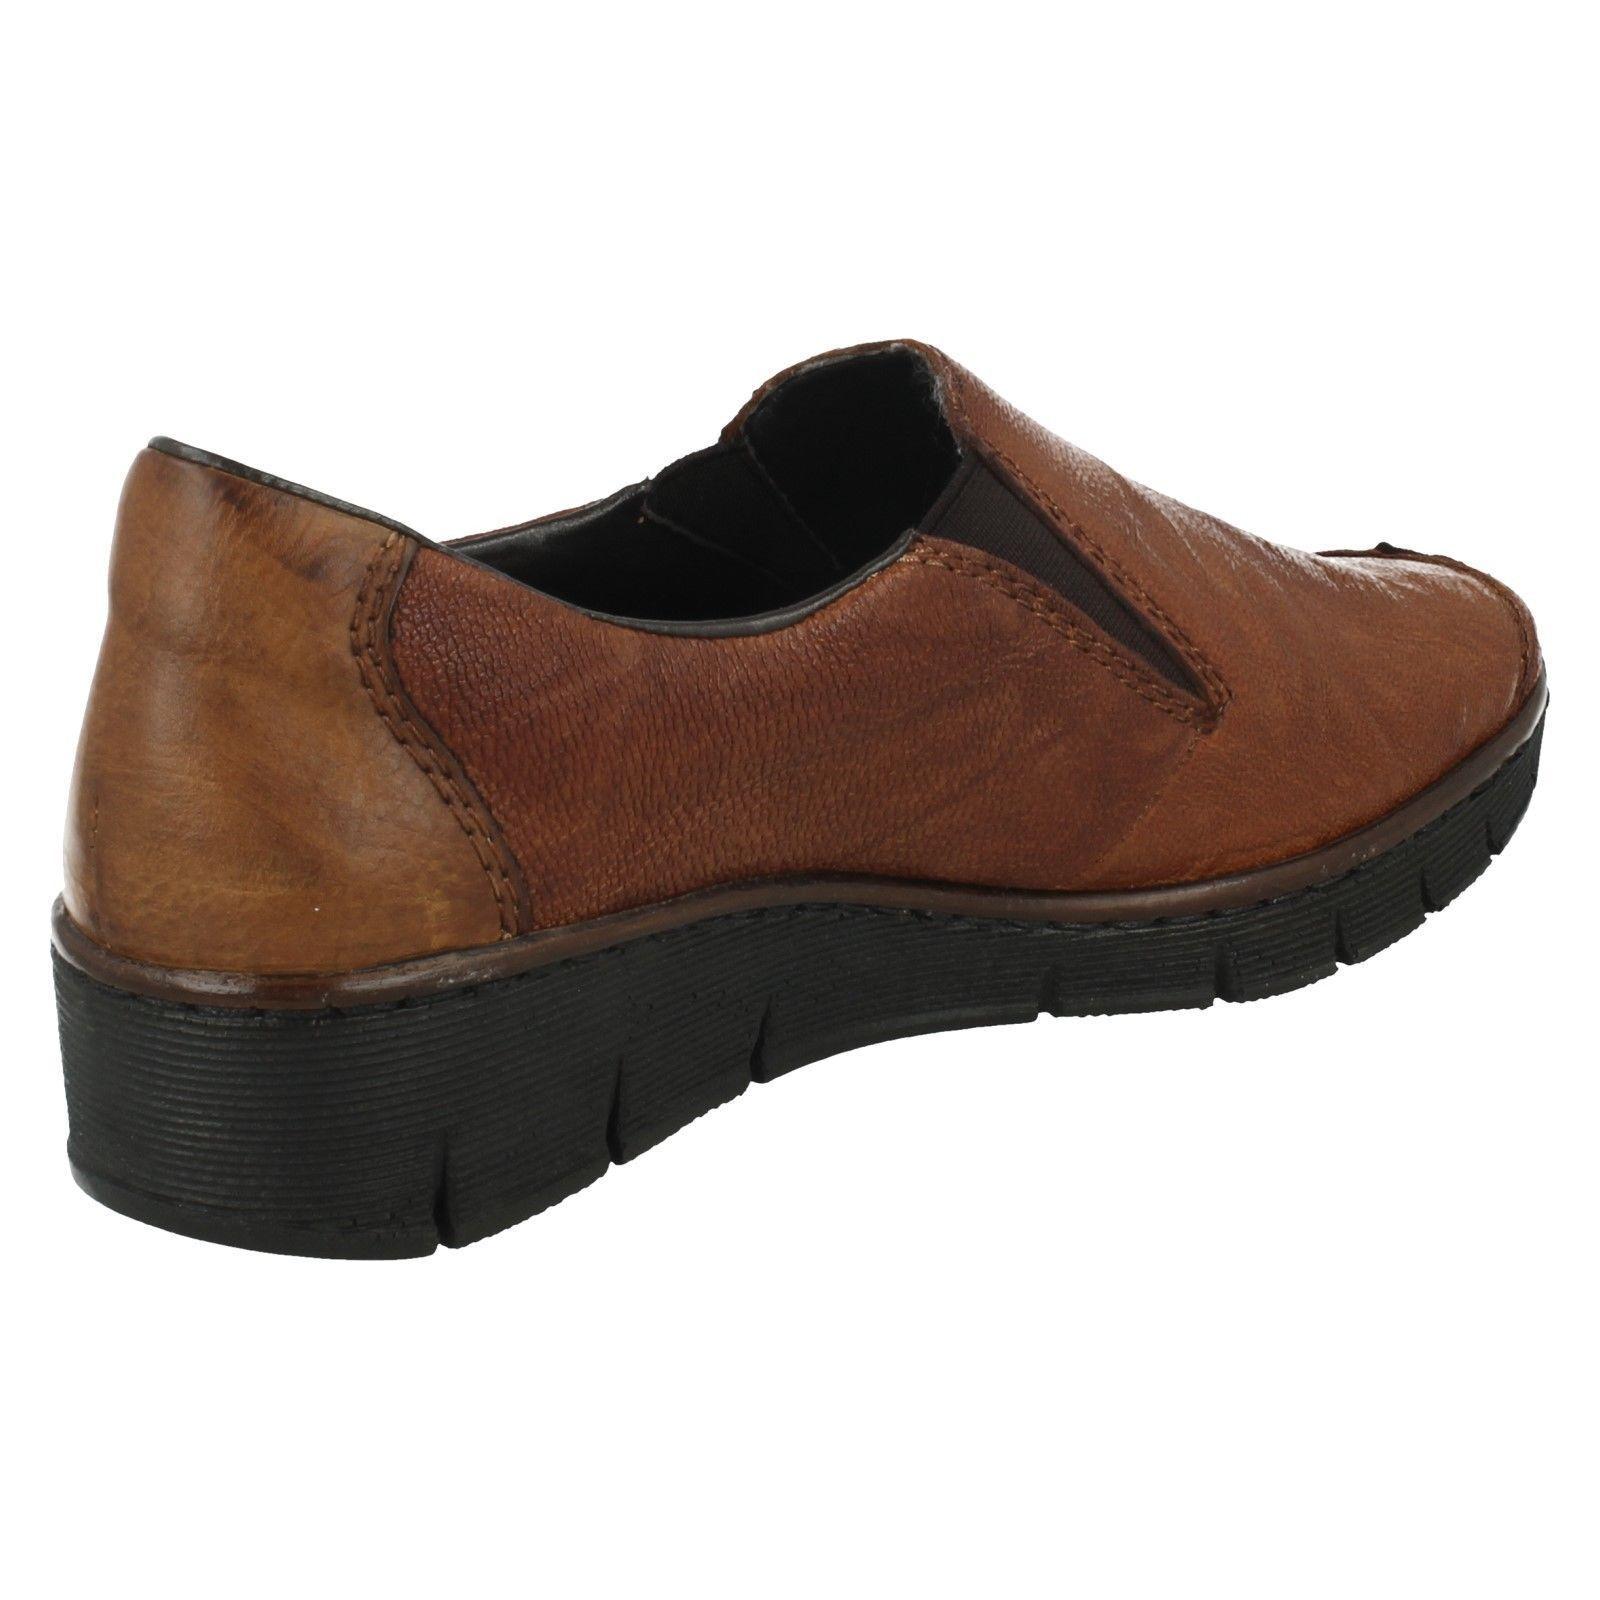 Damen Rieker' Keilabsatz Keilabsatz Keilabsatz Schuhe - 53783 626002